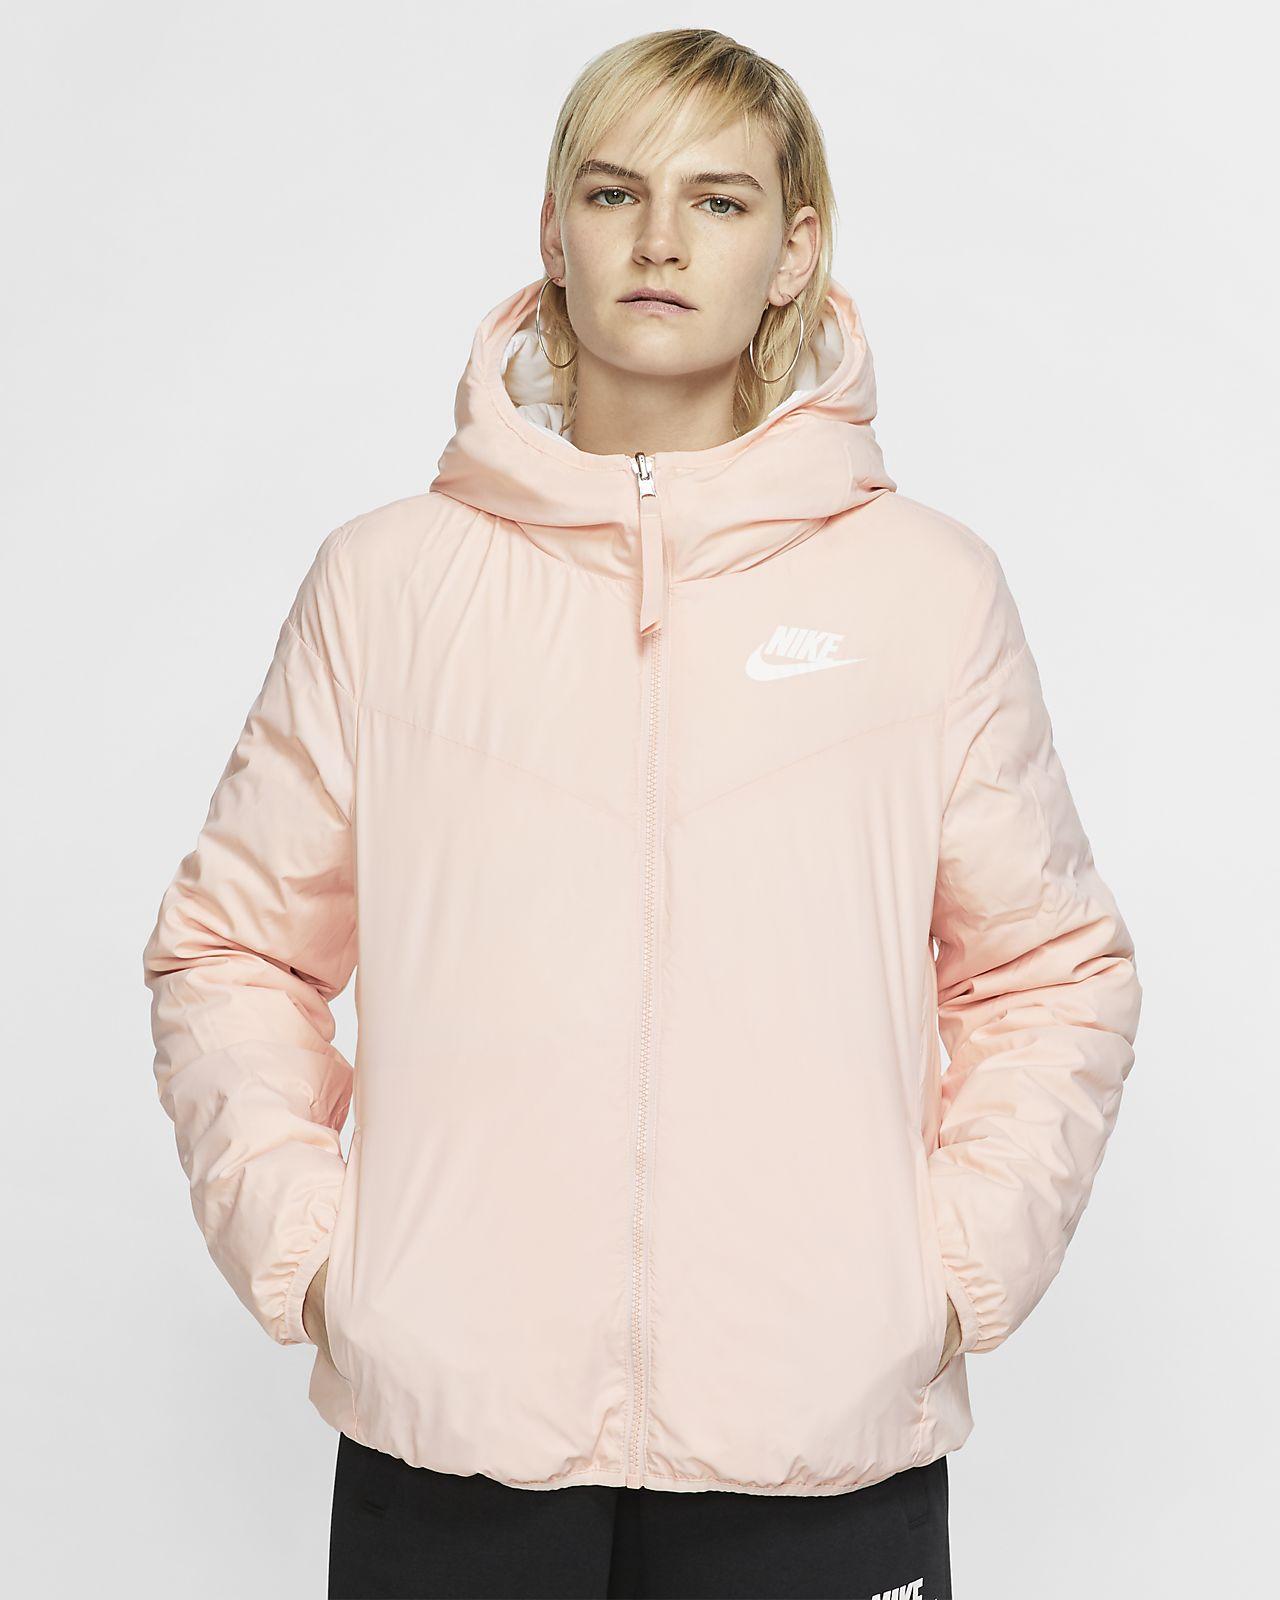 peach nike jacket